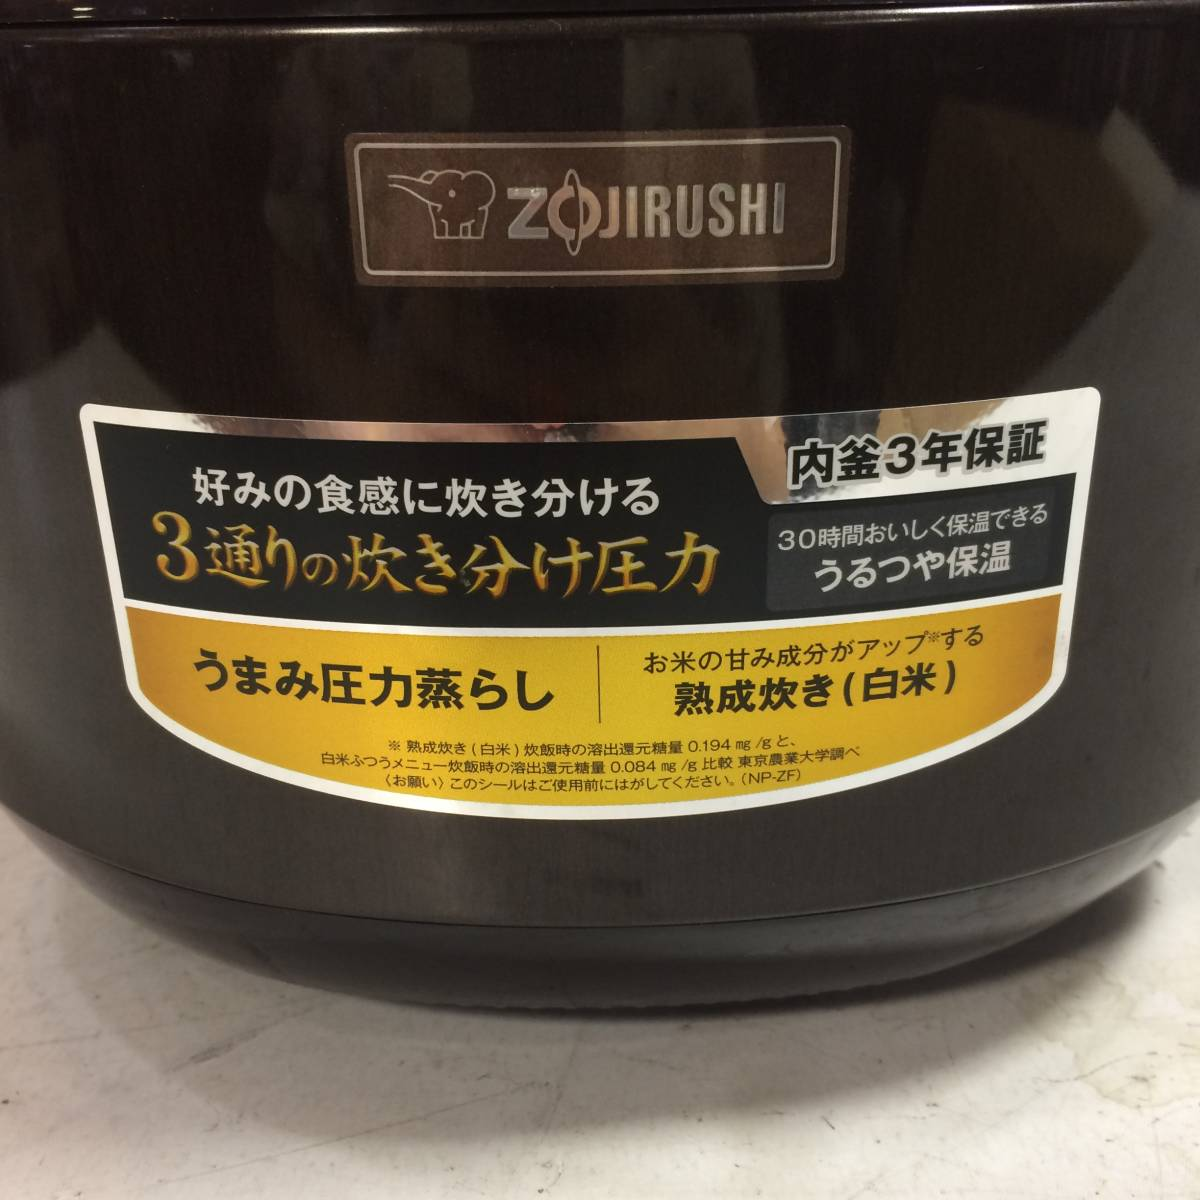 ZOJIRUSHI 象印 NP-ZF18-TD IHジャー 炊飯器 1升 1.8L 2017年製 【中古品】_画像3